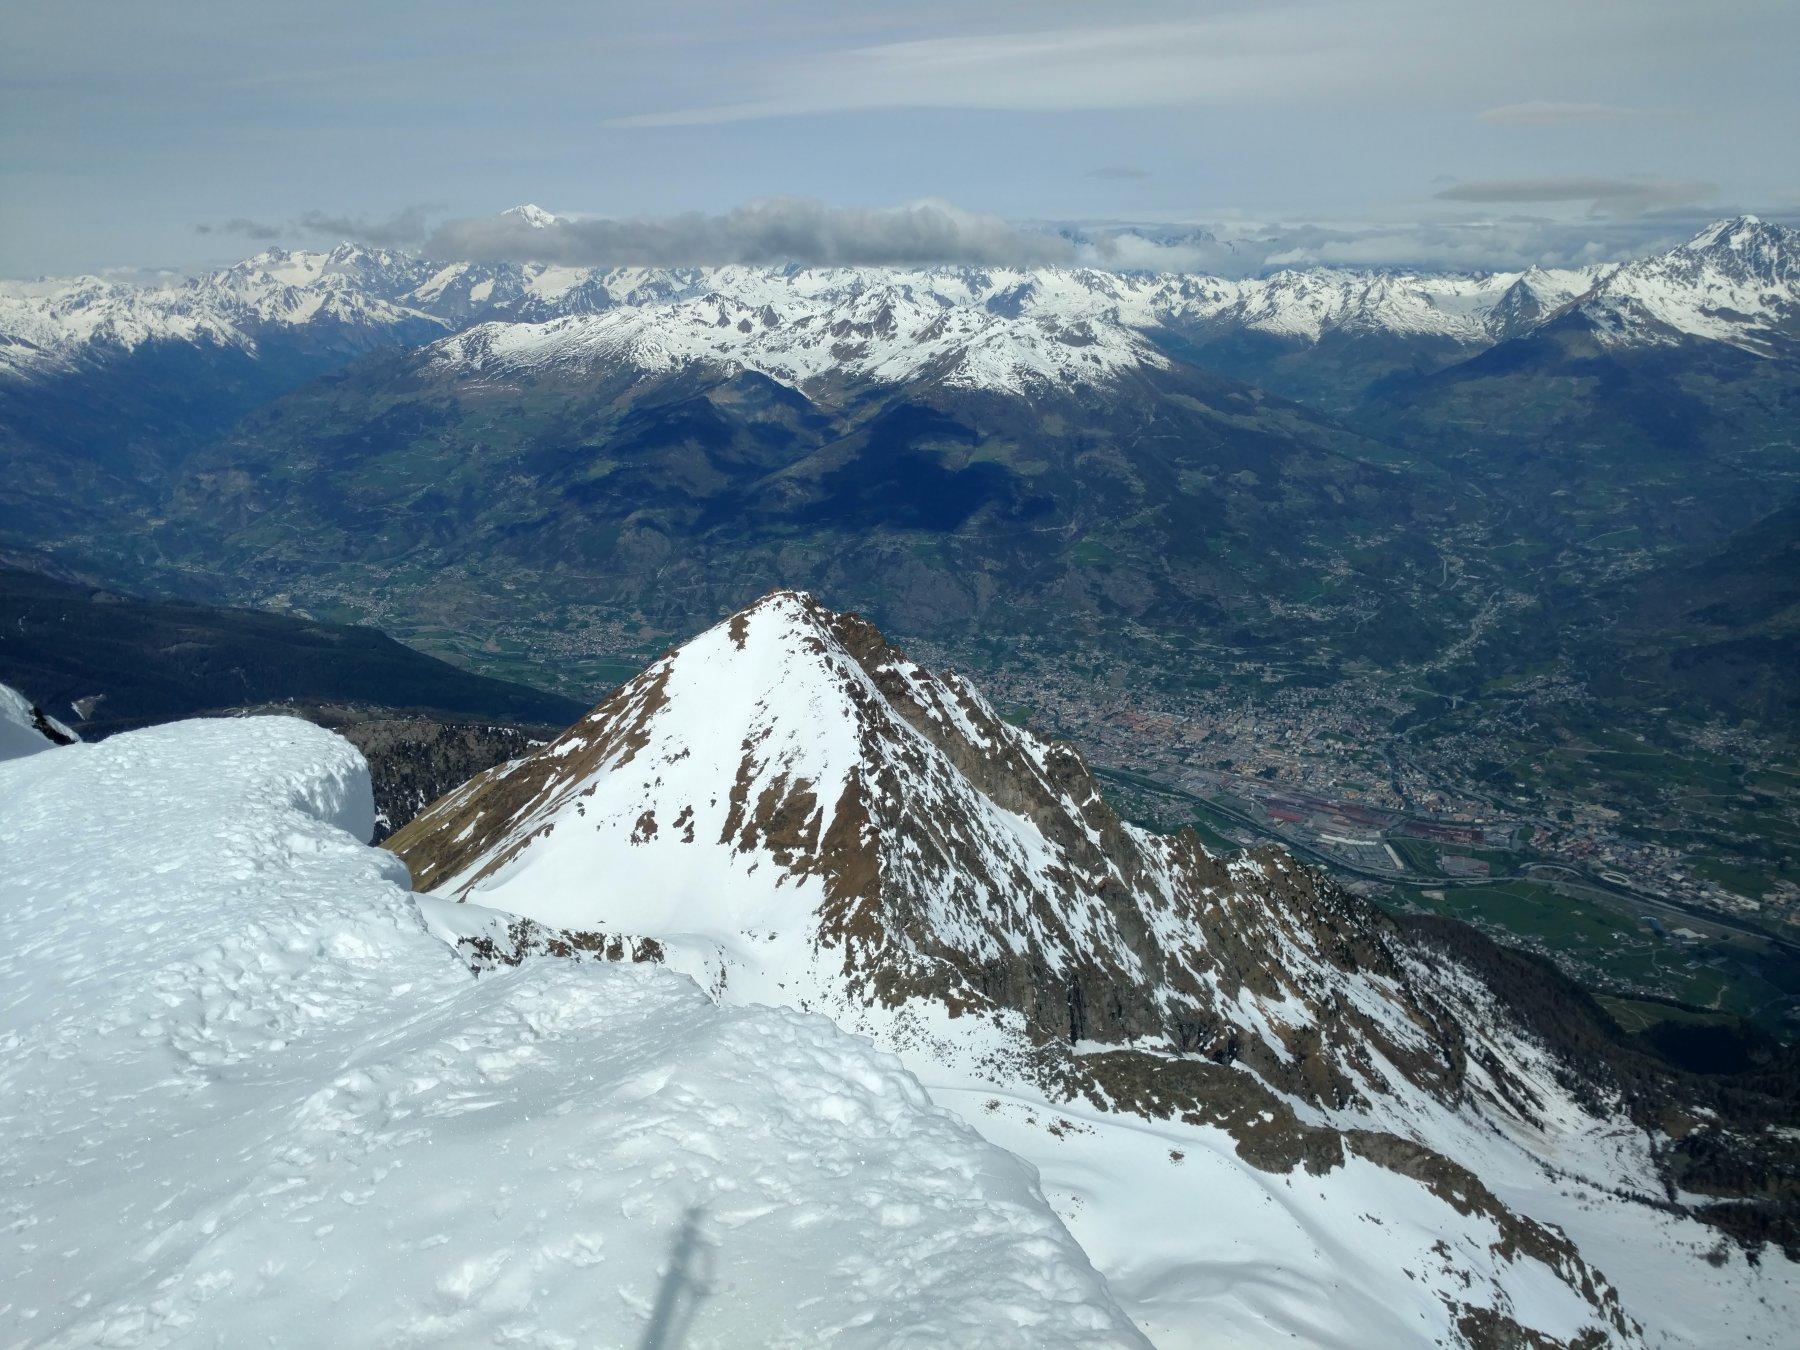 Becca di Nona e Aosta